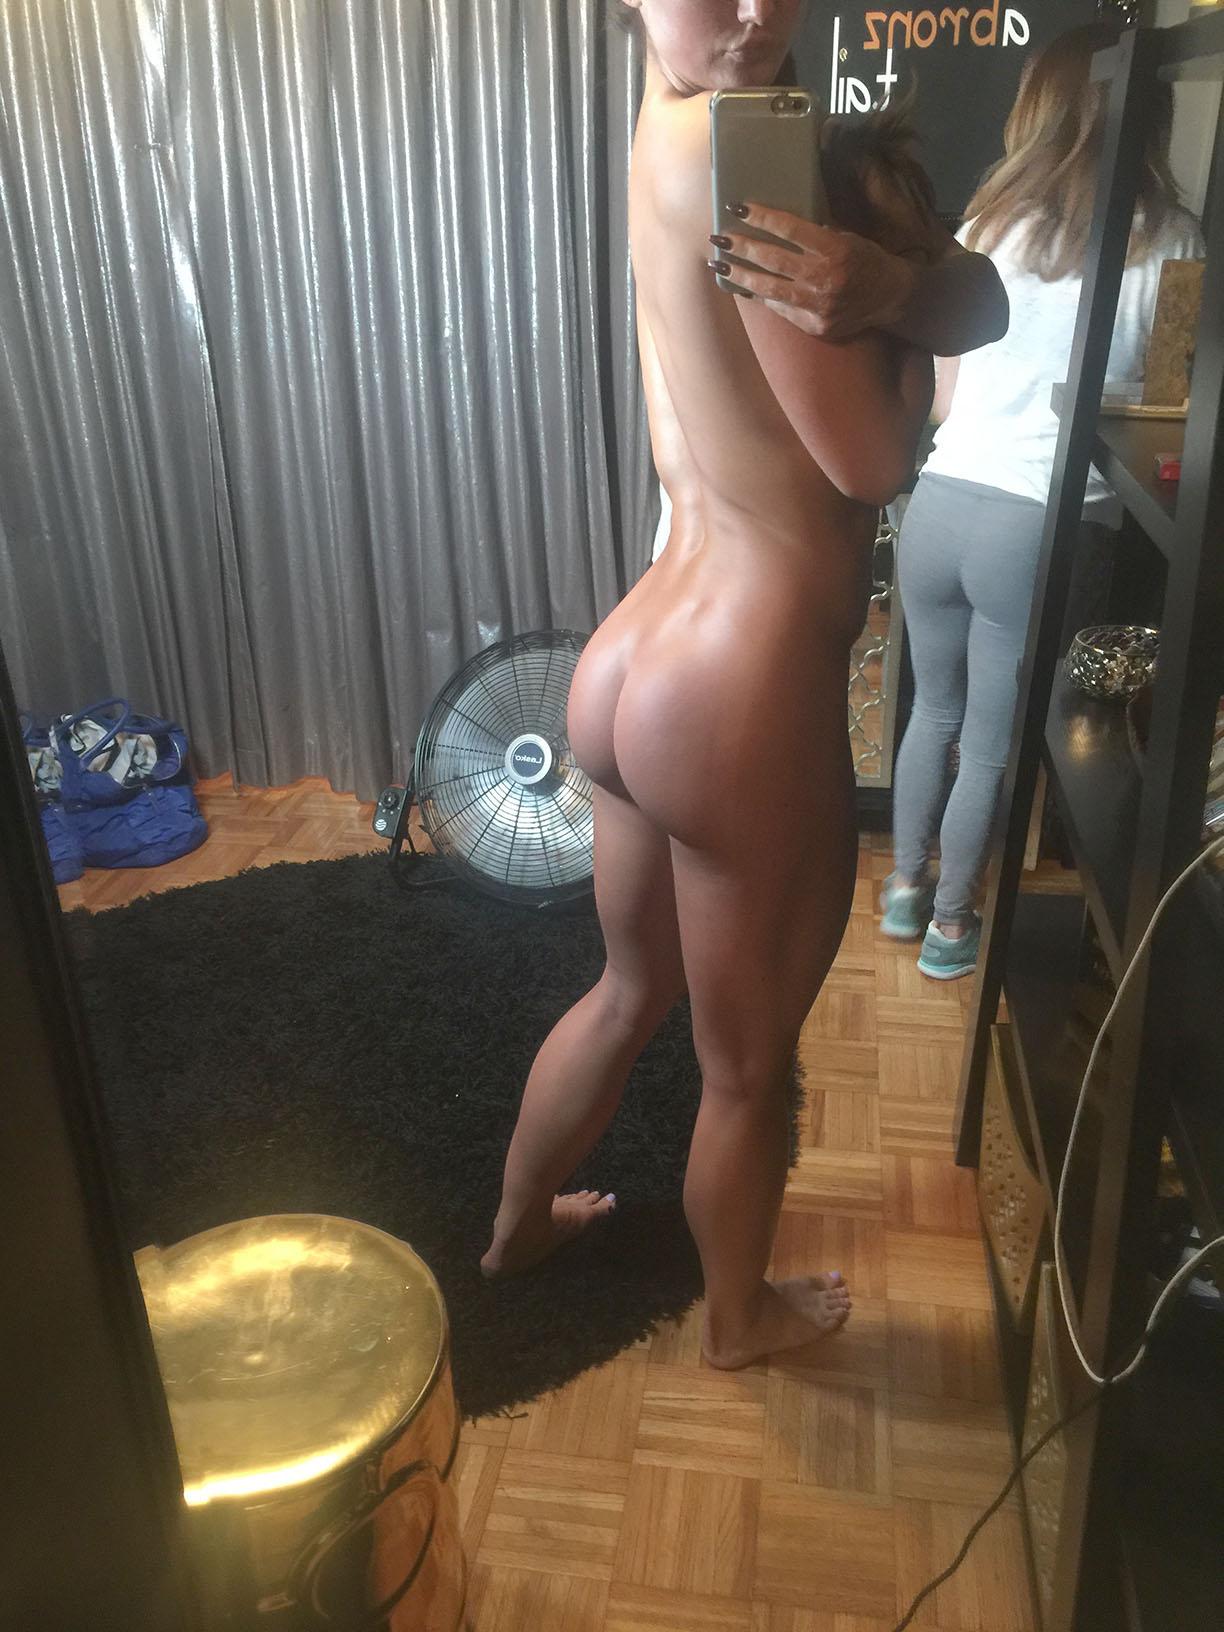 Topless pics of viktoria vikkii nude (27 pics)